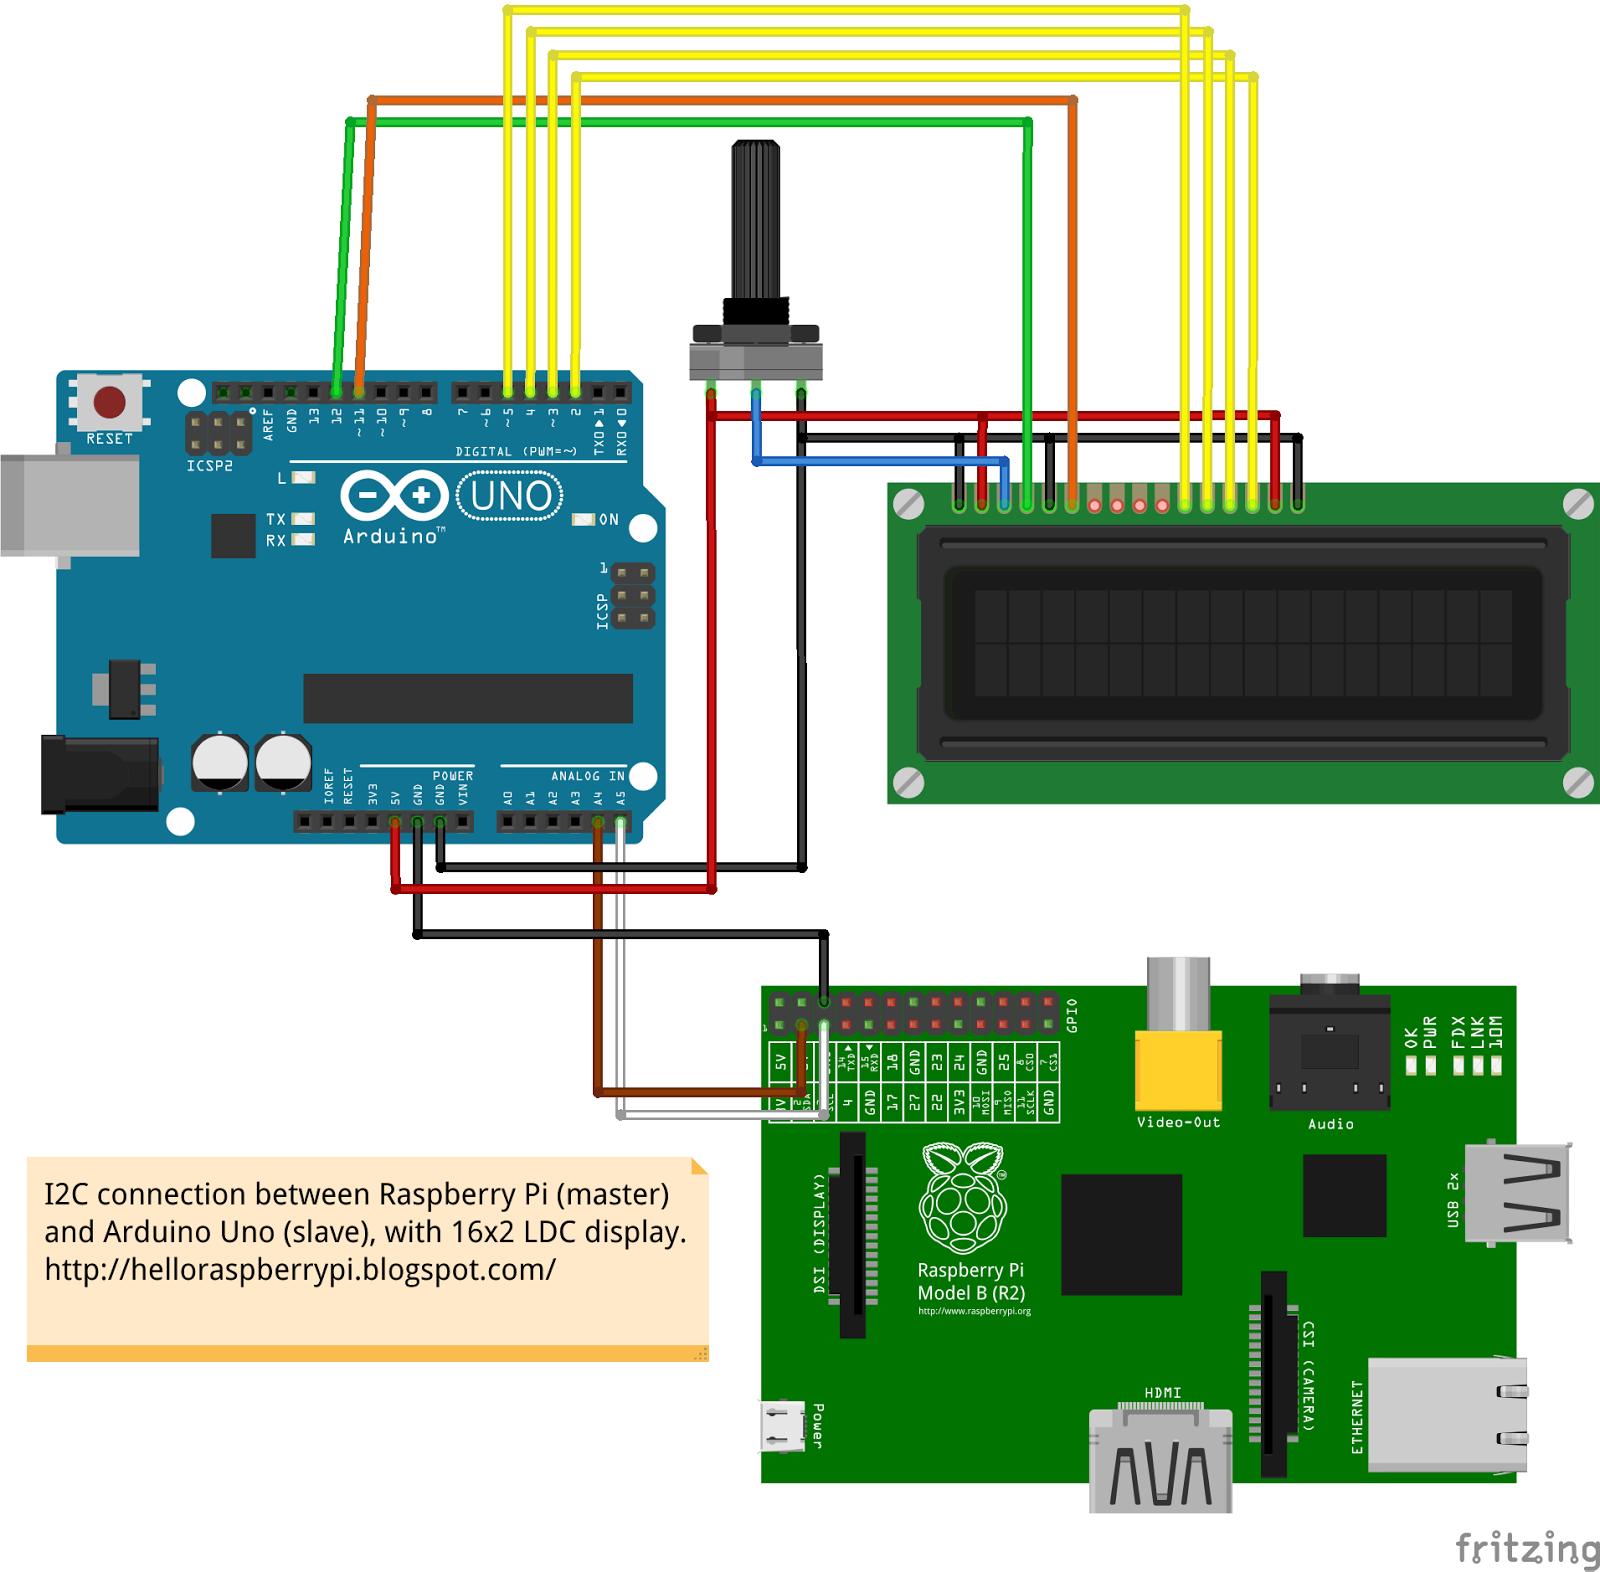 Hello Raspberry Pi: Raspberry Pi send block of data to Arduino using I2C